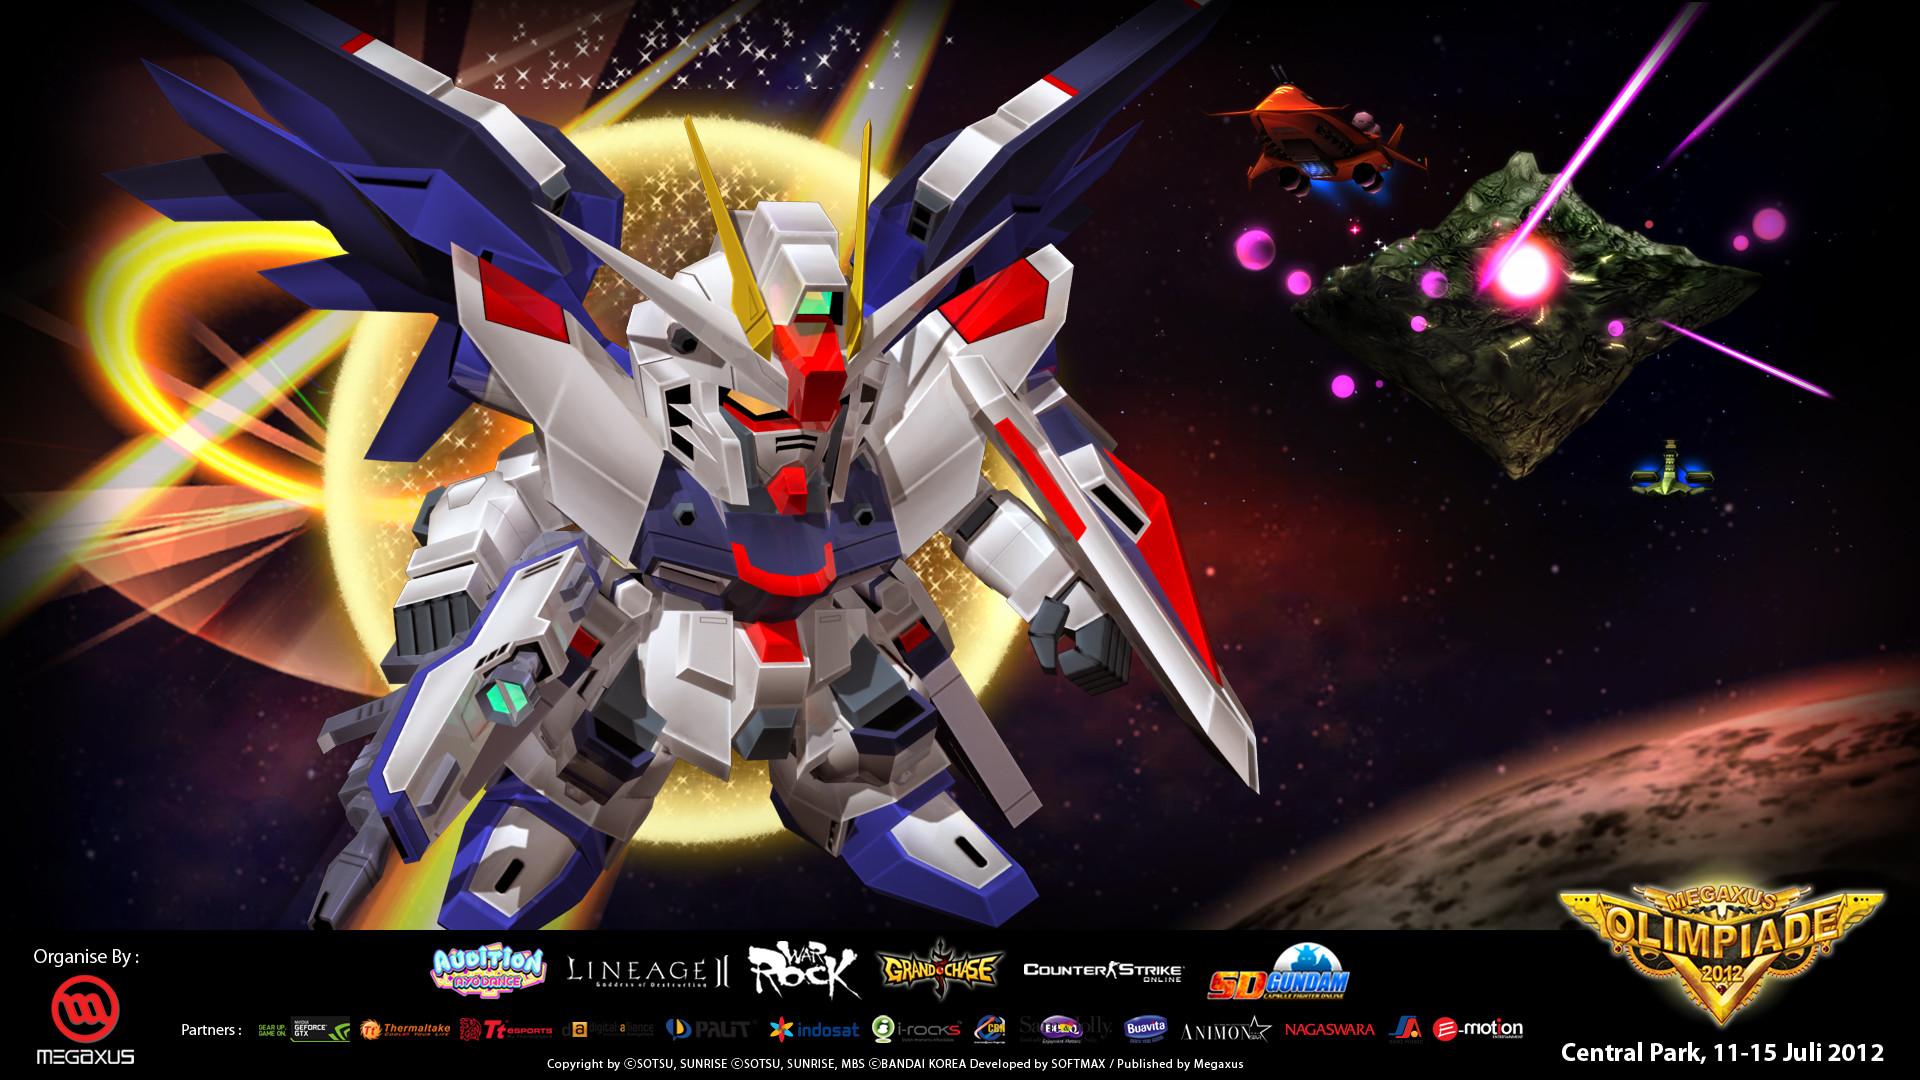 SD Gundam Capsule Fighter HD Wallpaper